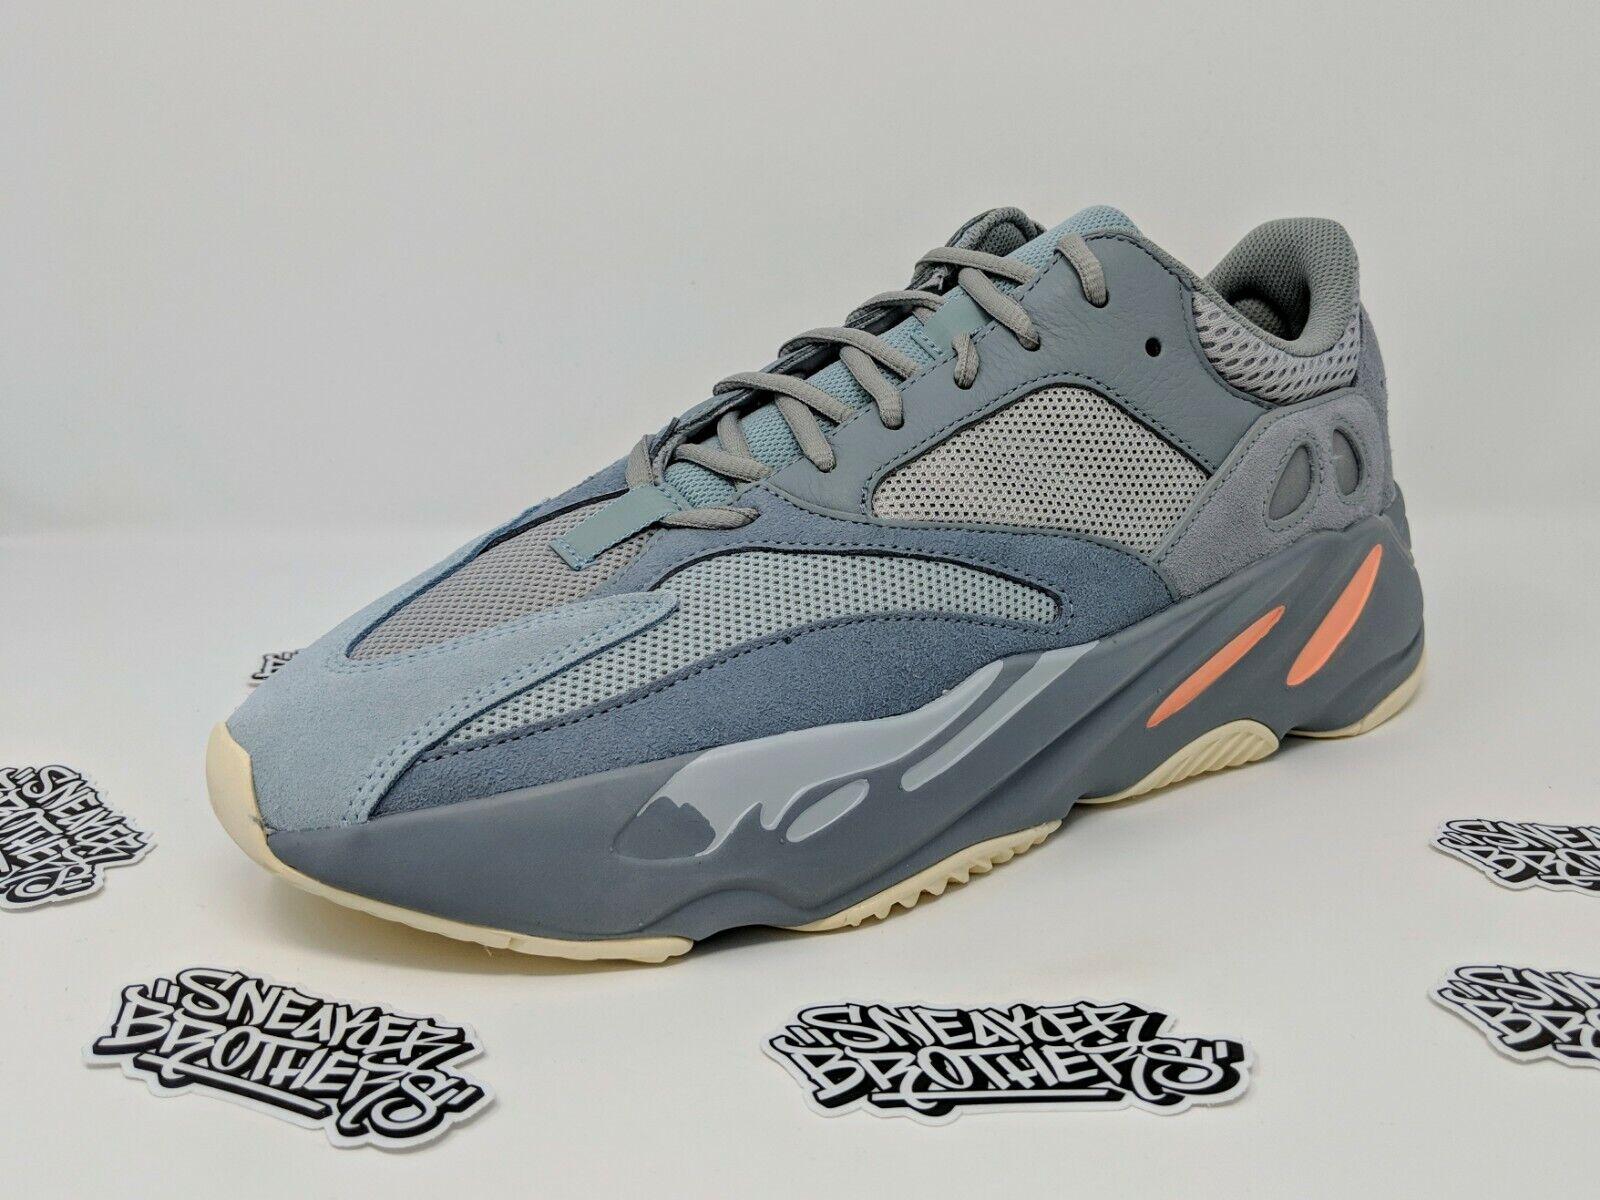 Adidas Yeezy Boost 700 Inertia Kanye West Authentic Limited EG7597